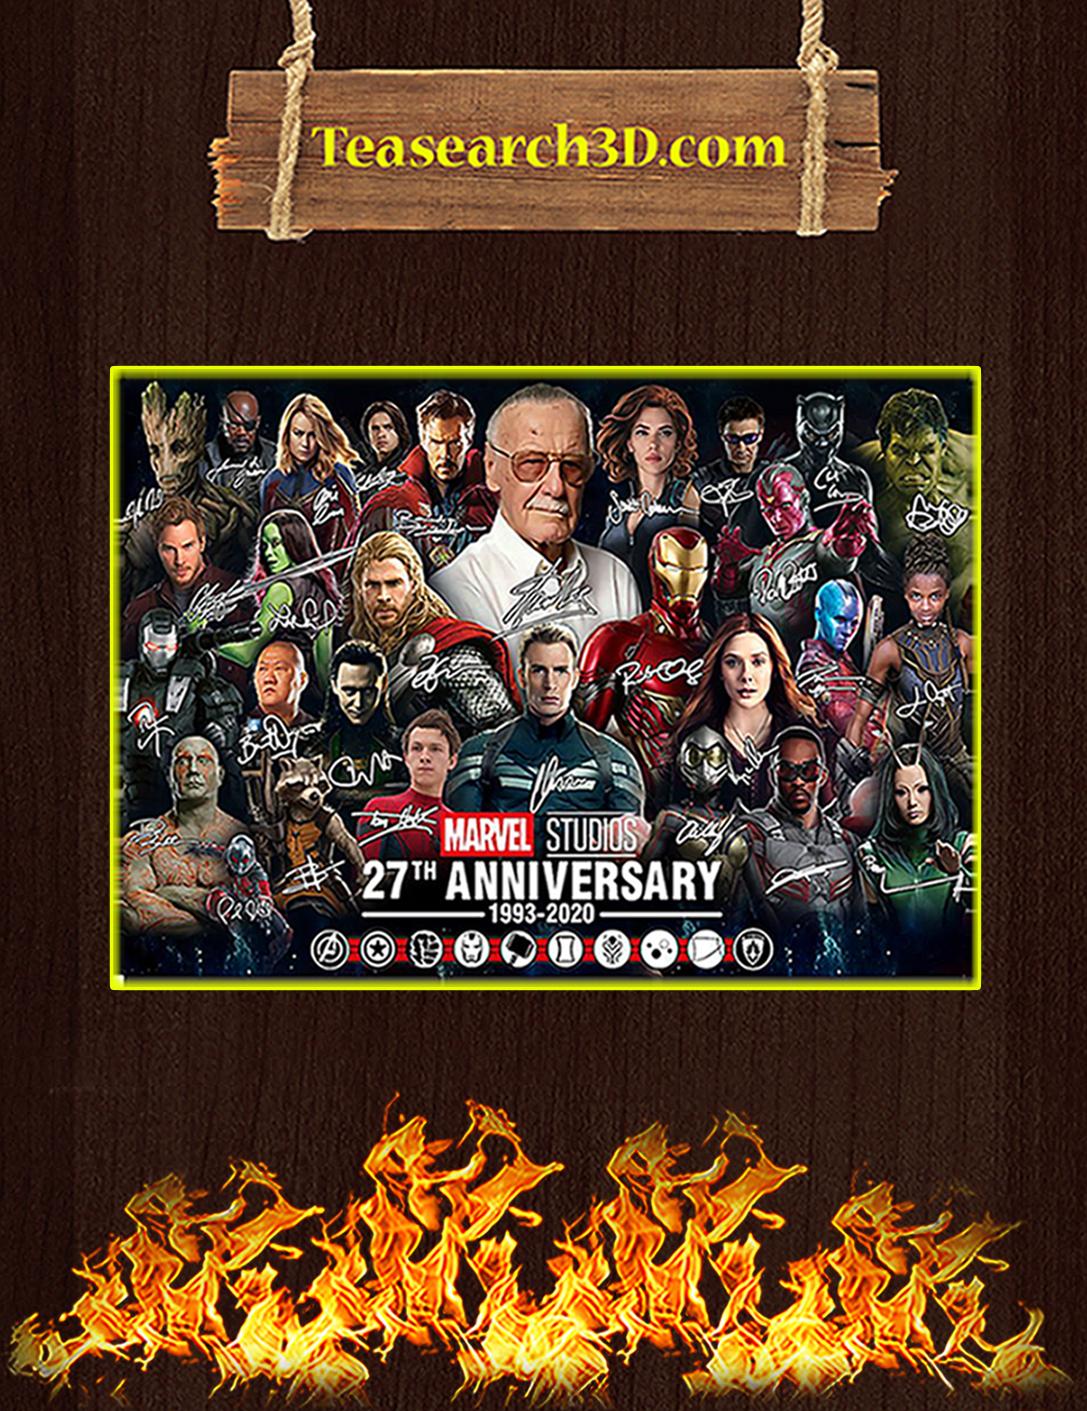 Marvel studios 27th anniversary signature poster A2